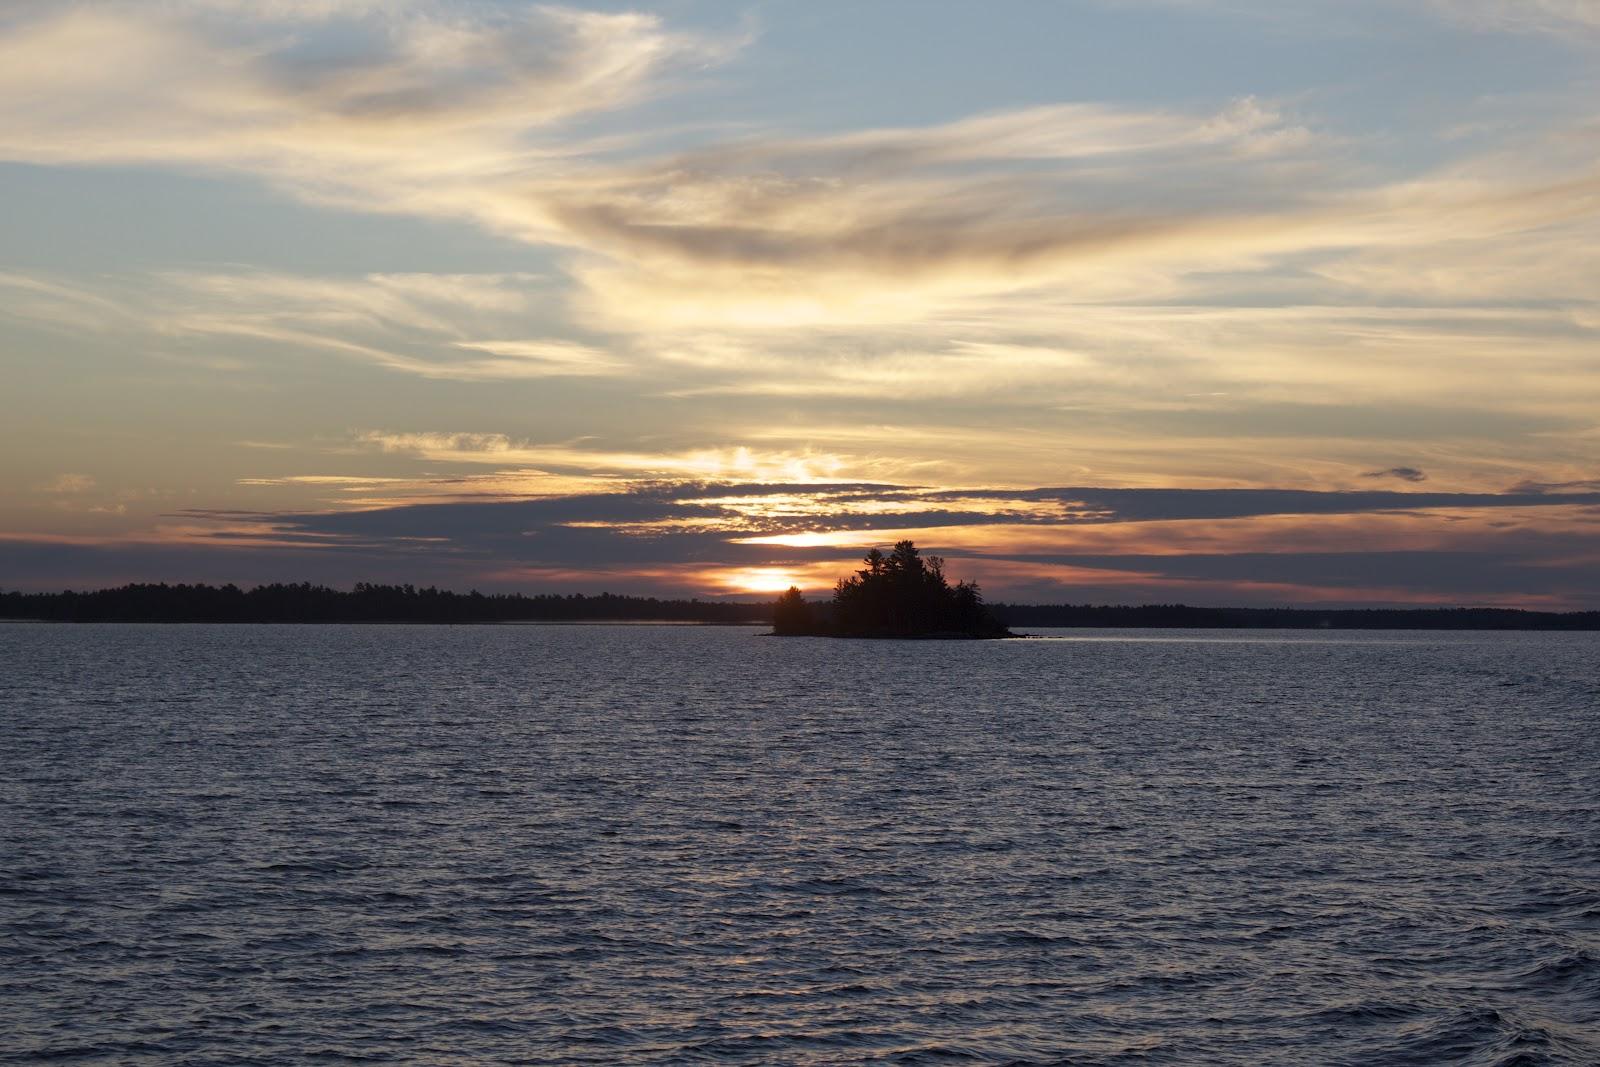 Rainy lake houseboats fishing report carl heltne retires for Rainy lake fishing